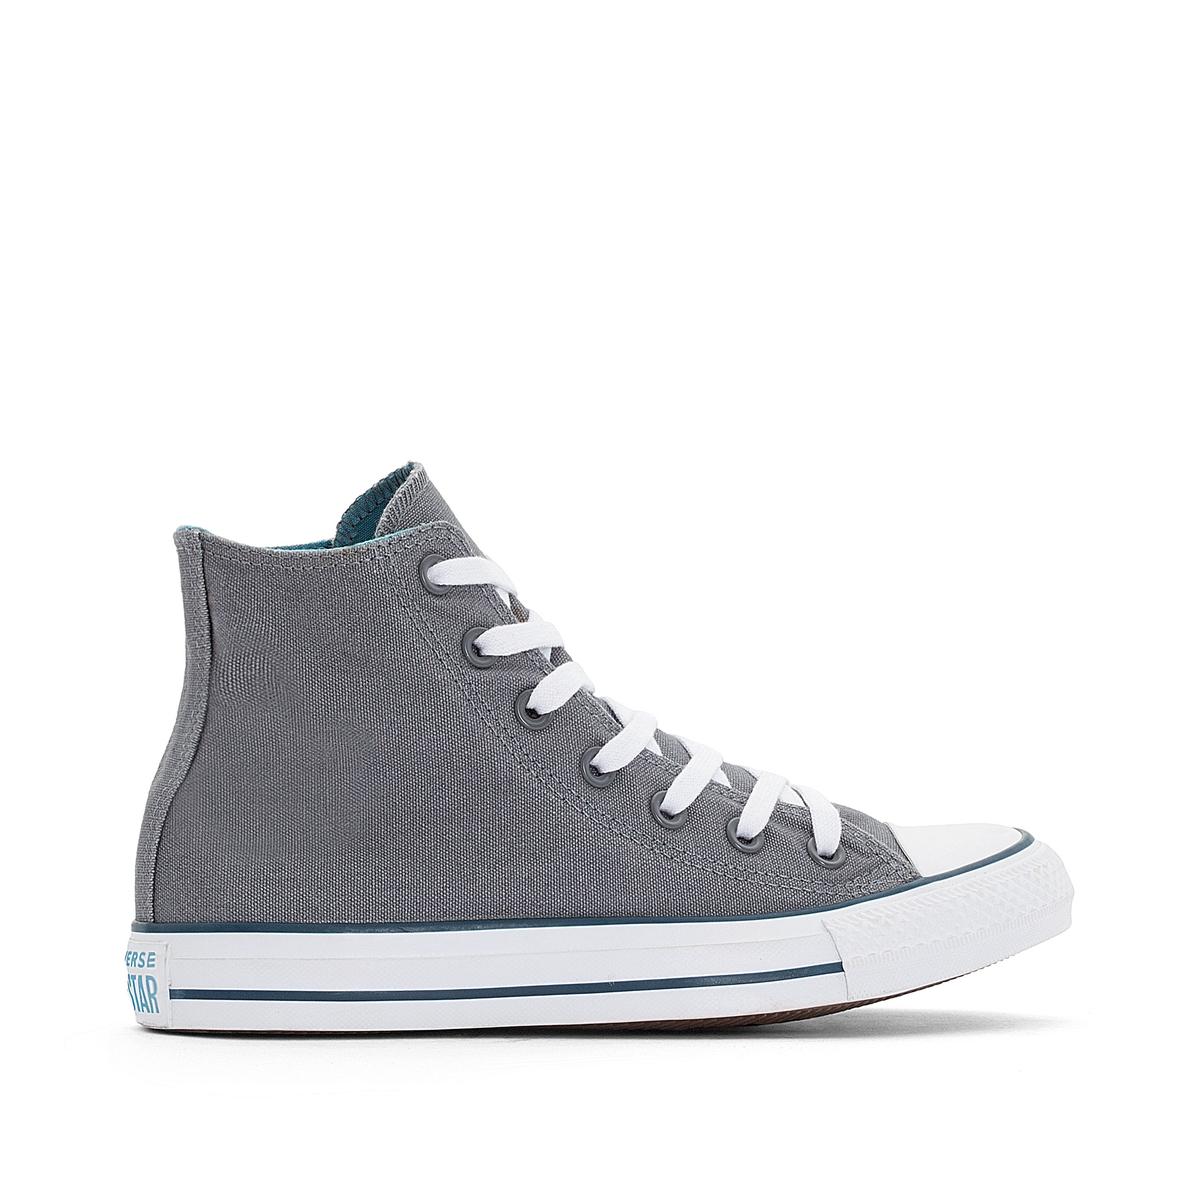 Zapatillas deportivas Chuck Taylor All Star